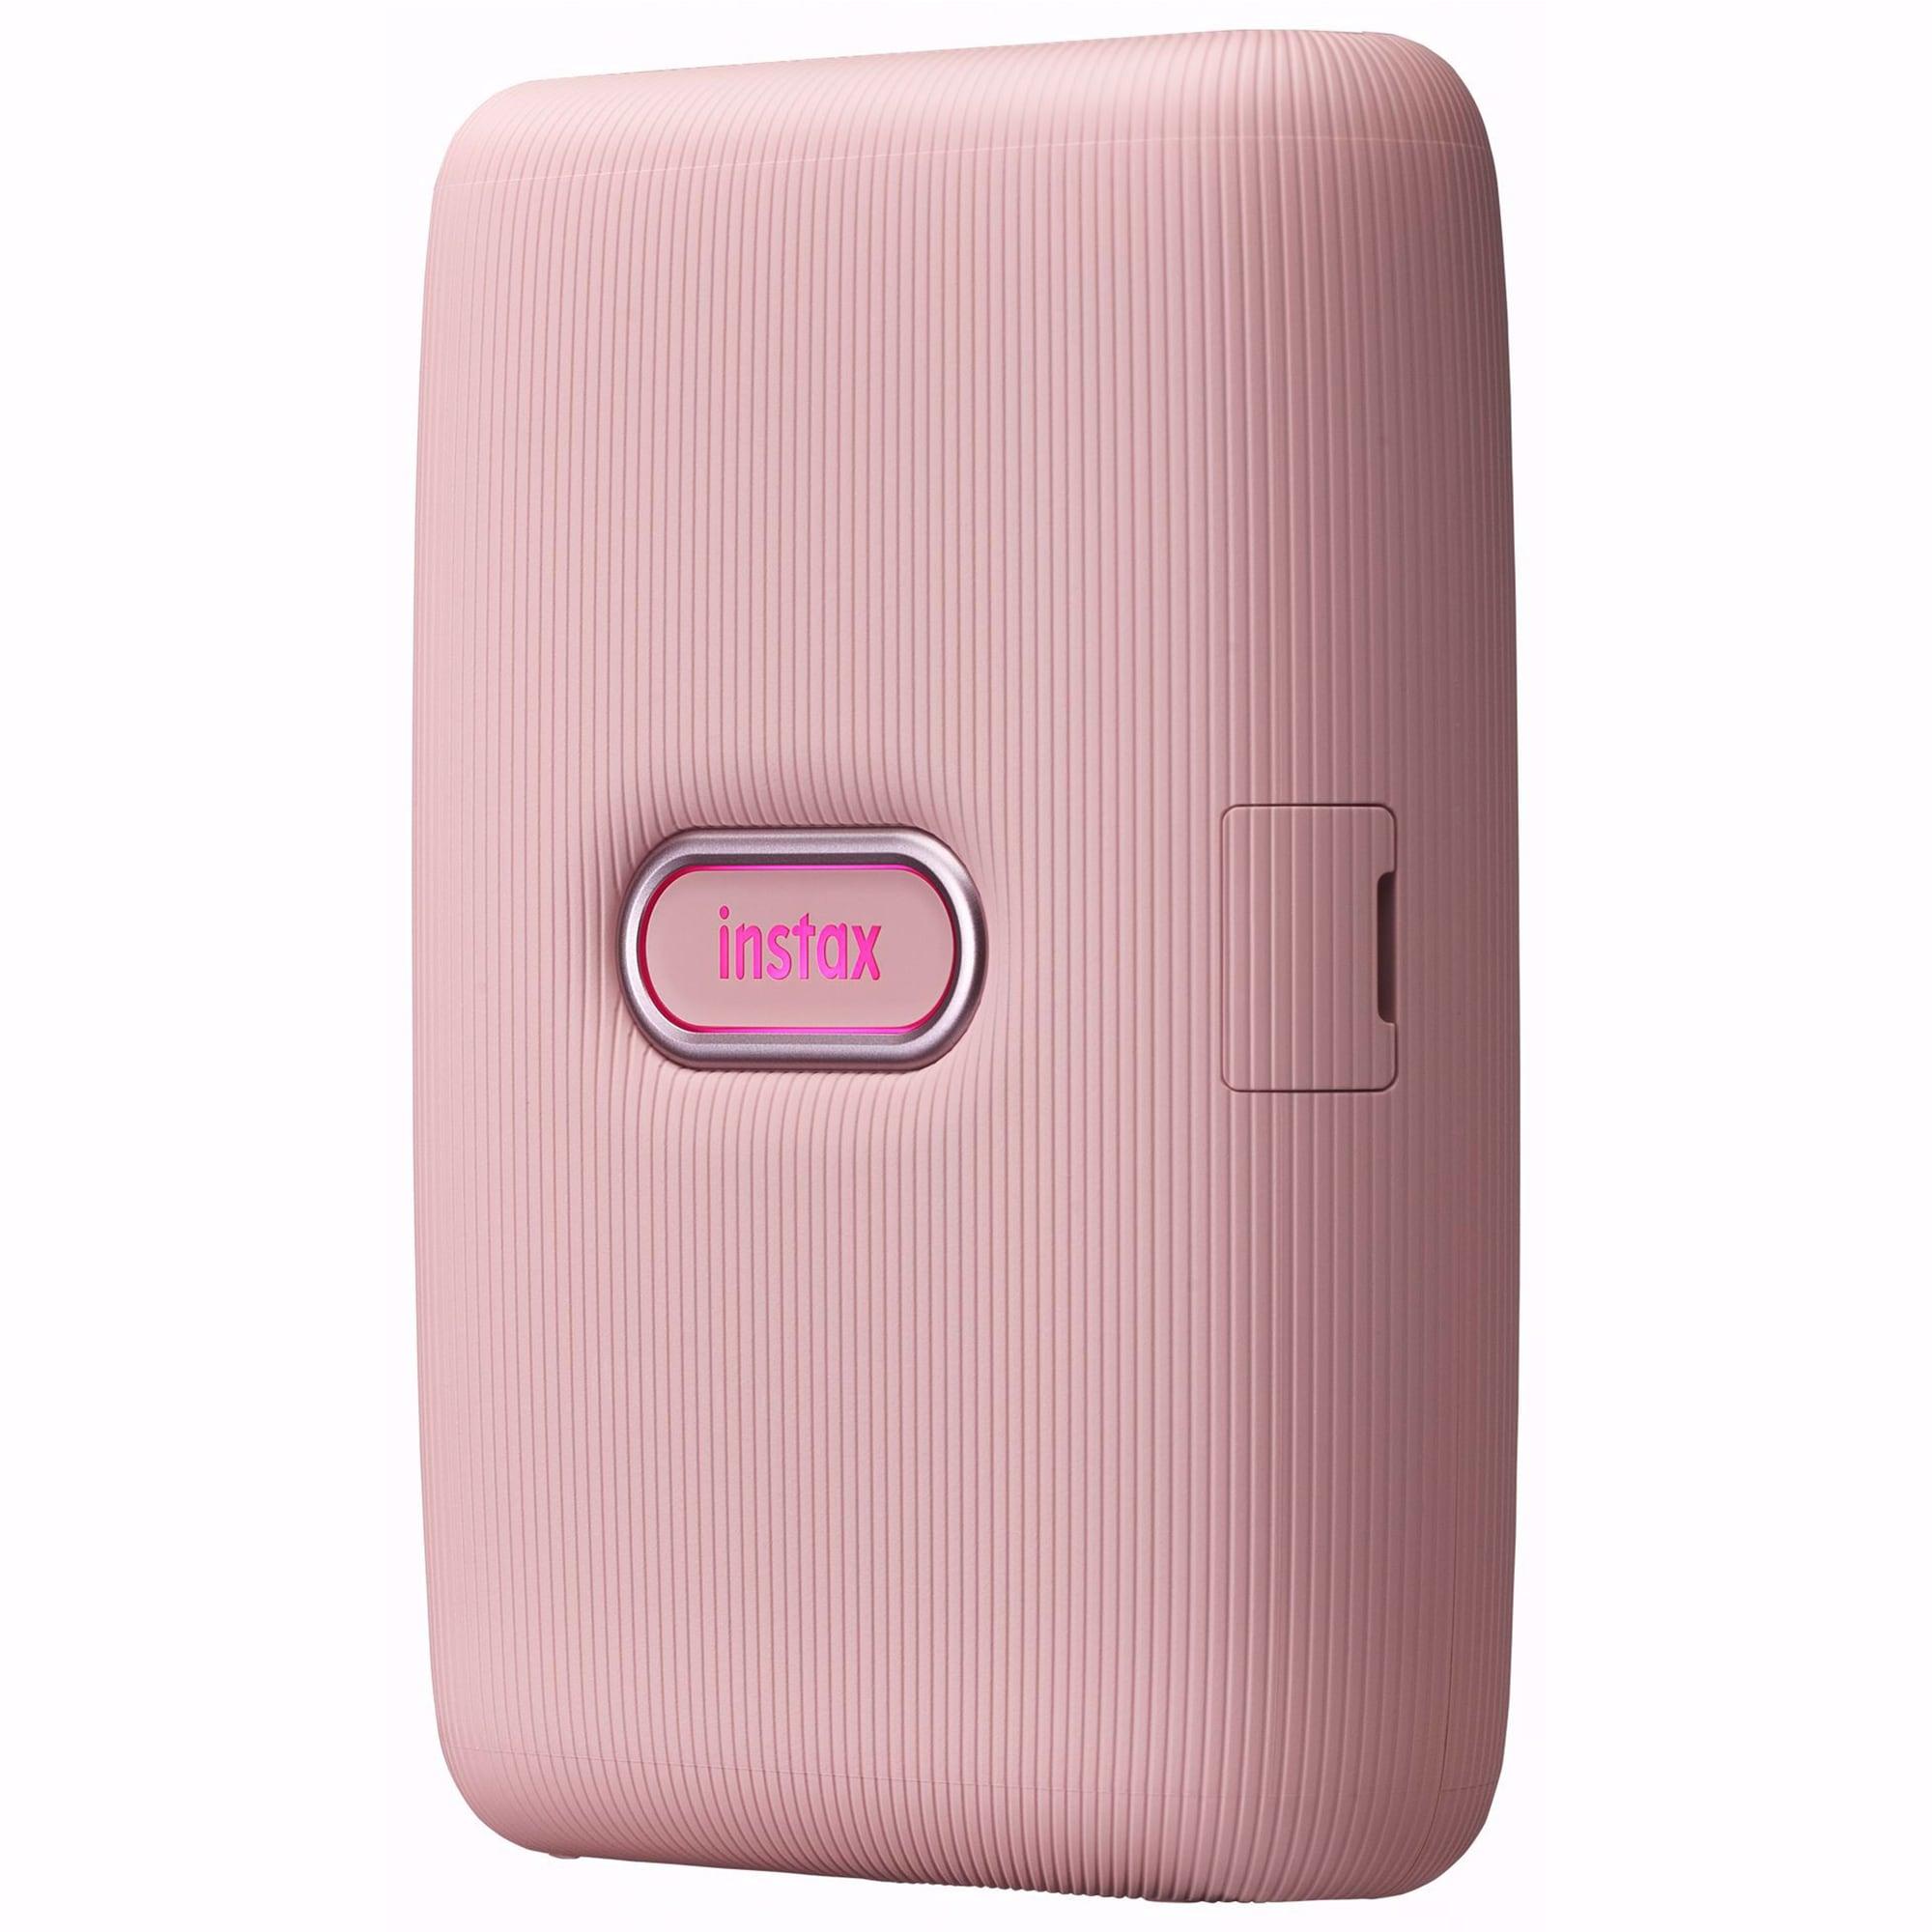 fujifilm-instax-mini-link-dusky-pink-side